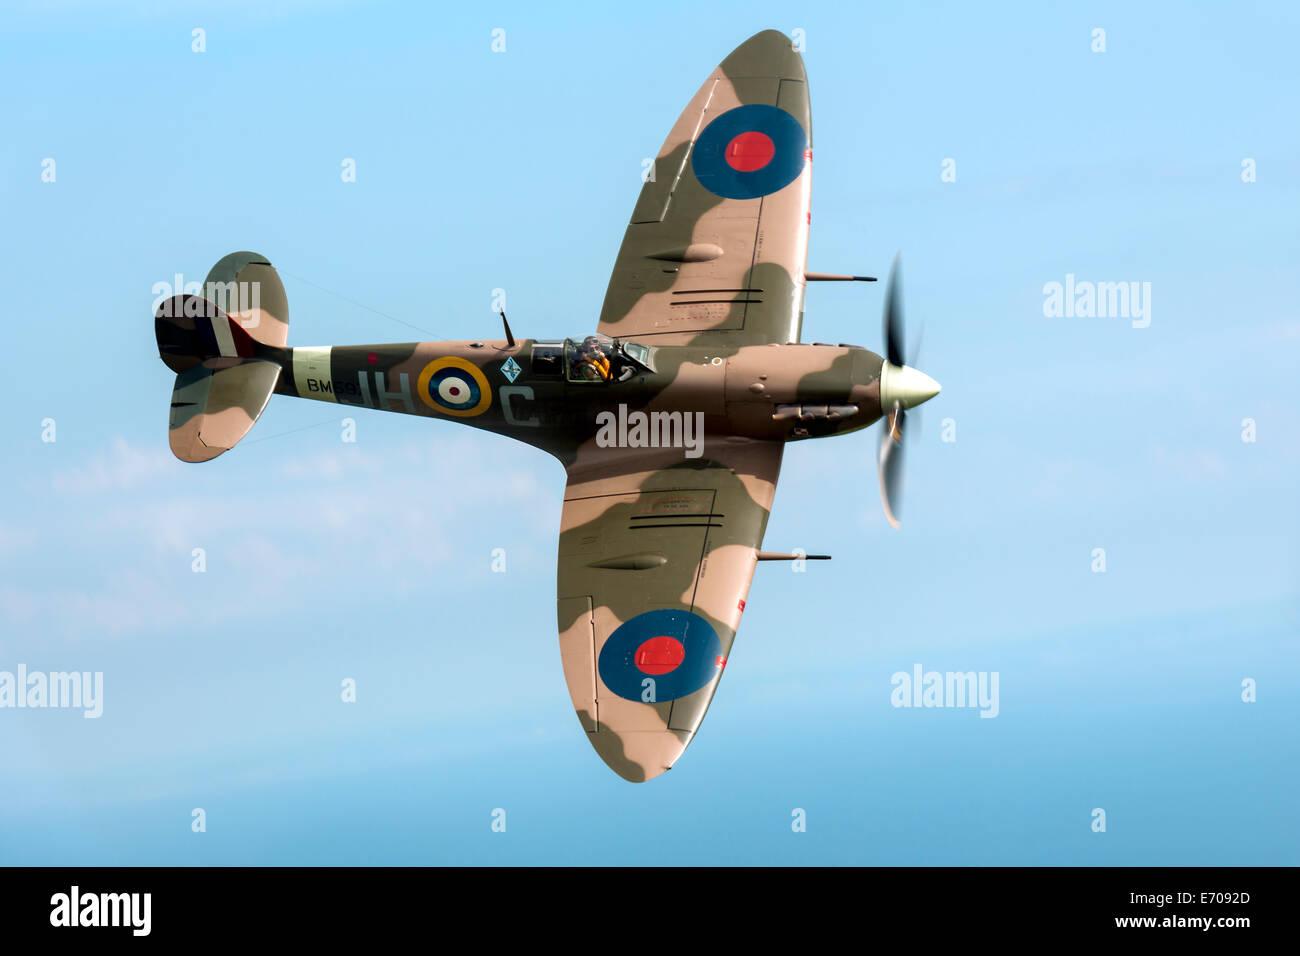 Vickers Supermarine Spitfire MK VB  G-MKVB - Stock Image